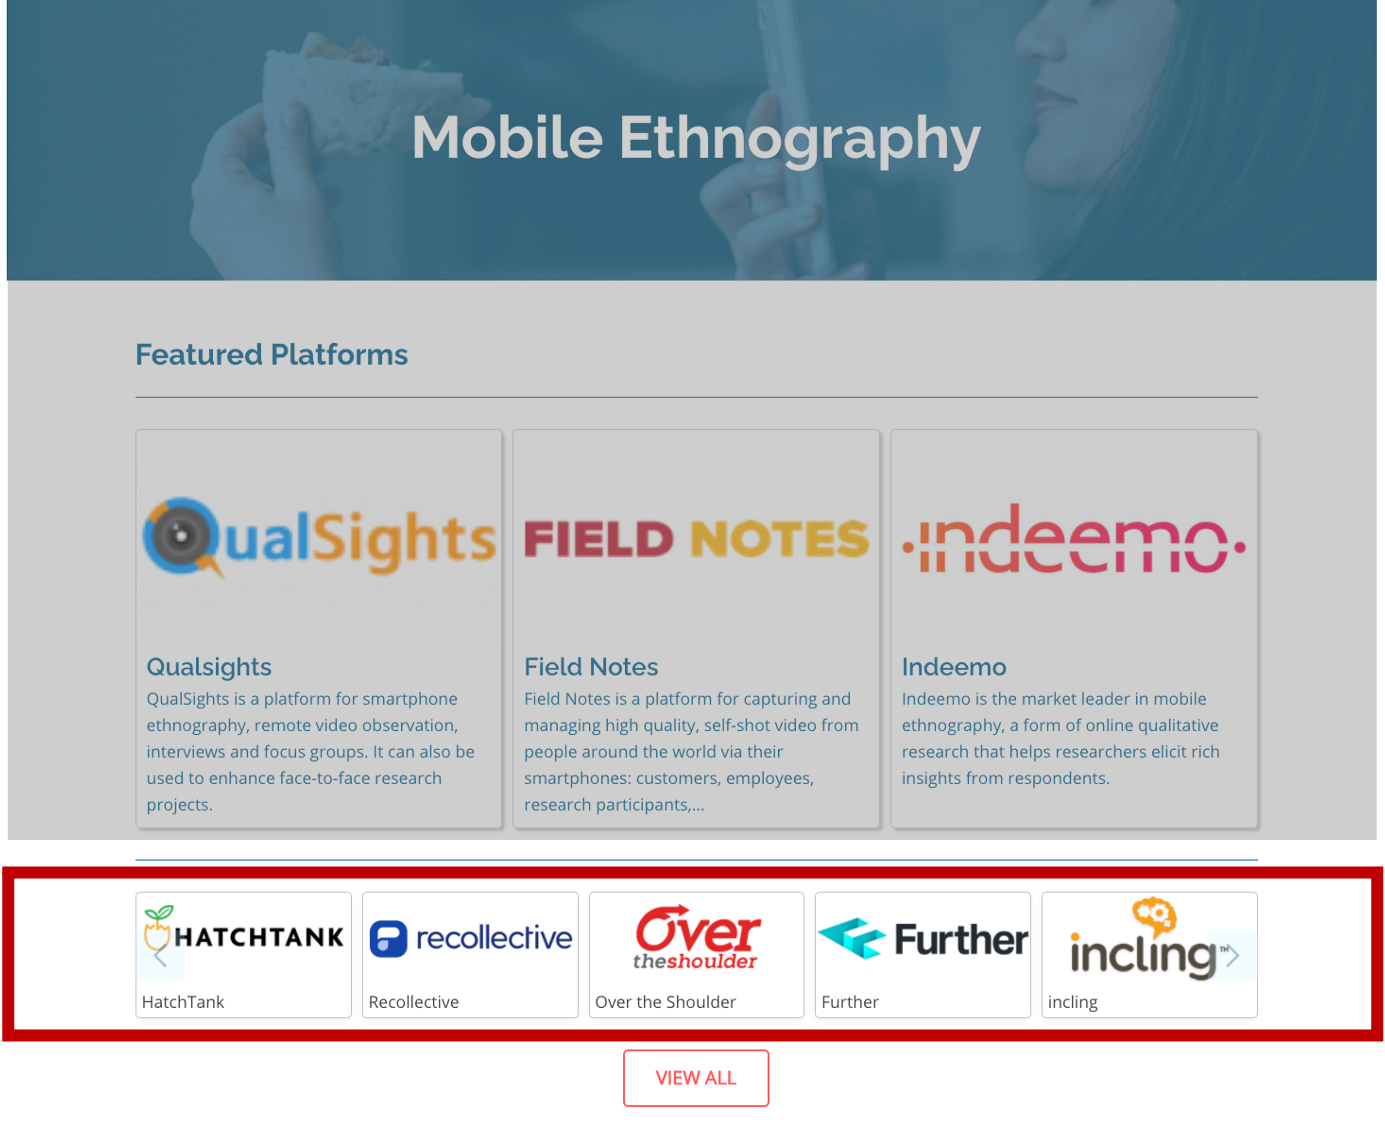 Category Page Secondary Position - Insight Platforms